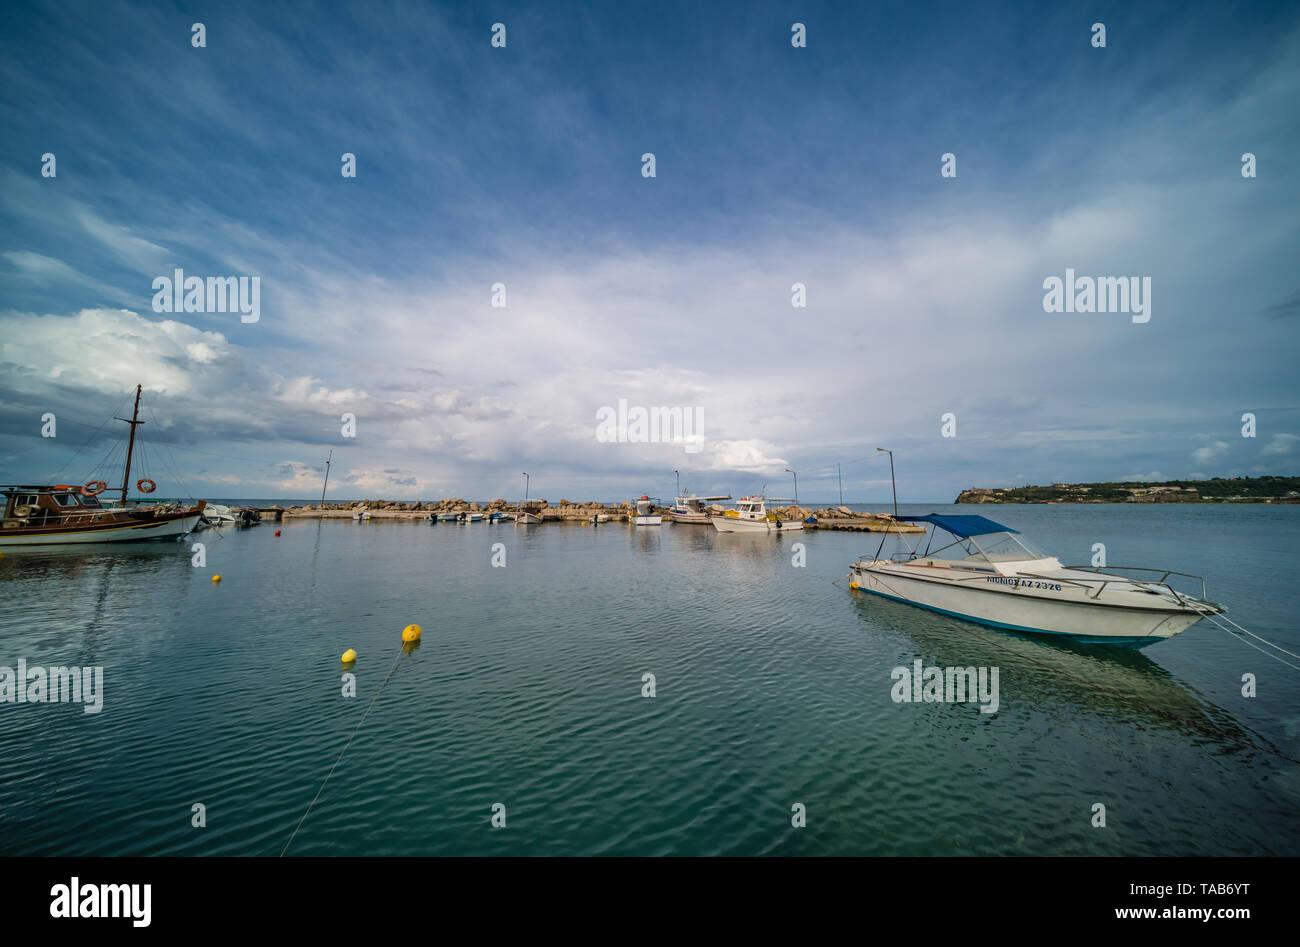 Zakynthos, Greece -  April 2019 : Wide angle view of the small private boats moored in port near Tsilivi beach in summer, Zante Island - Stock Image